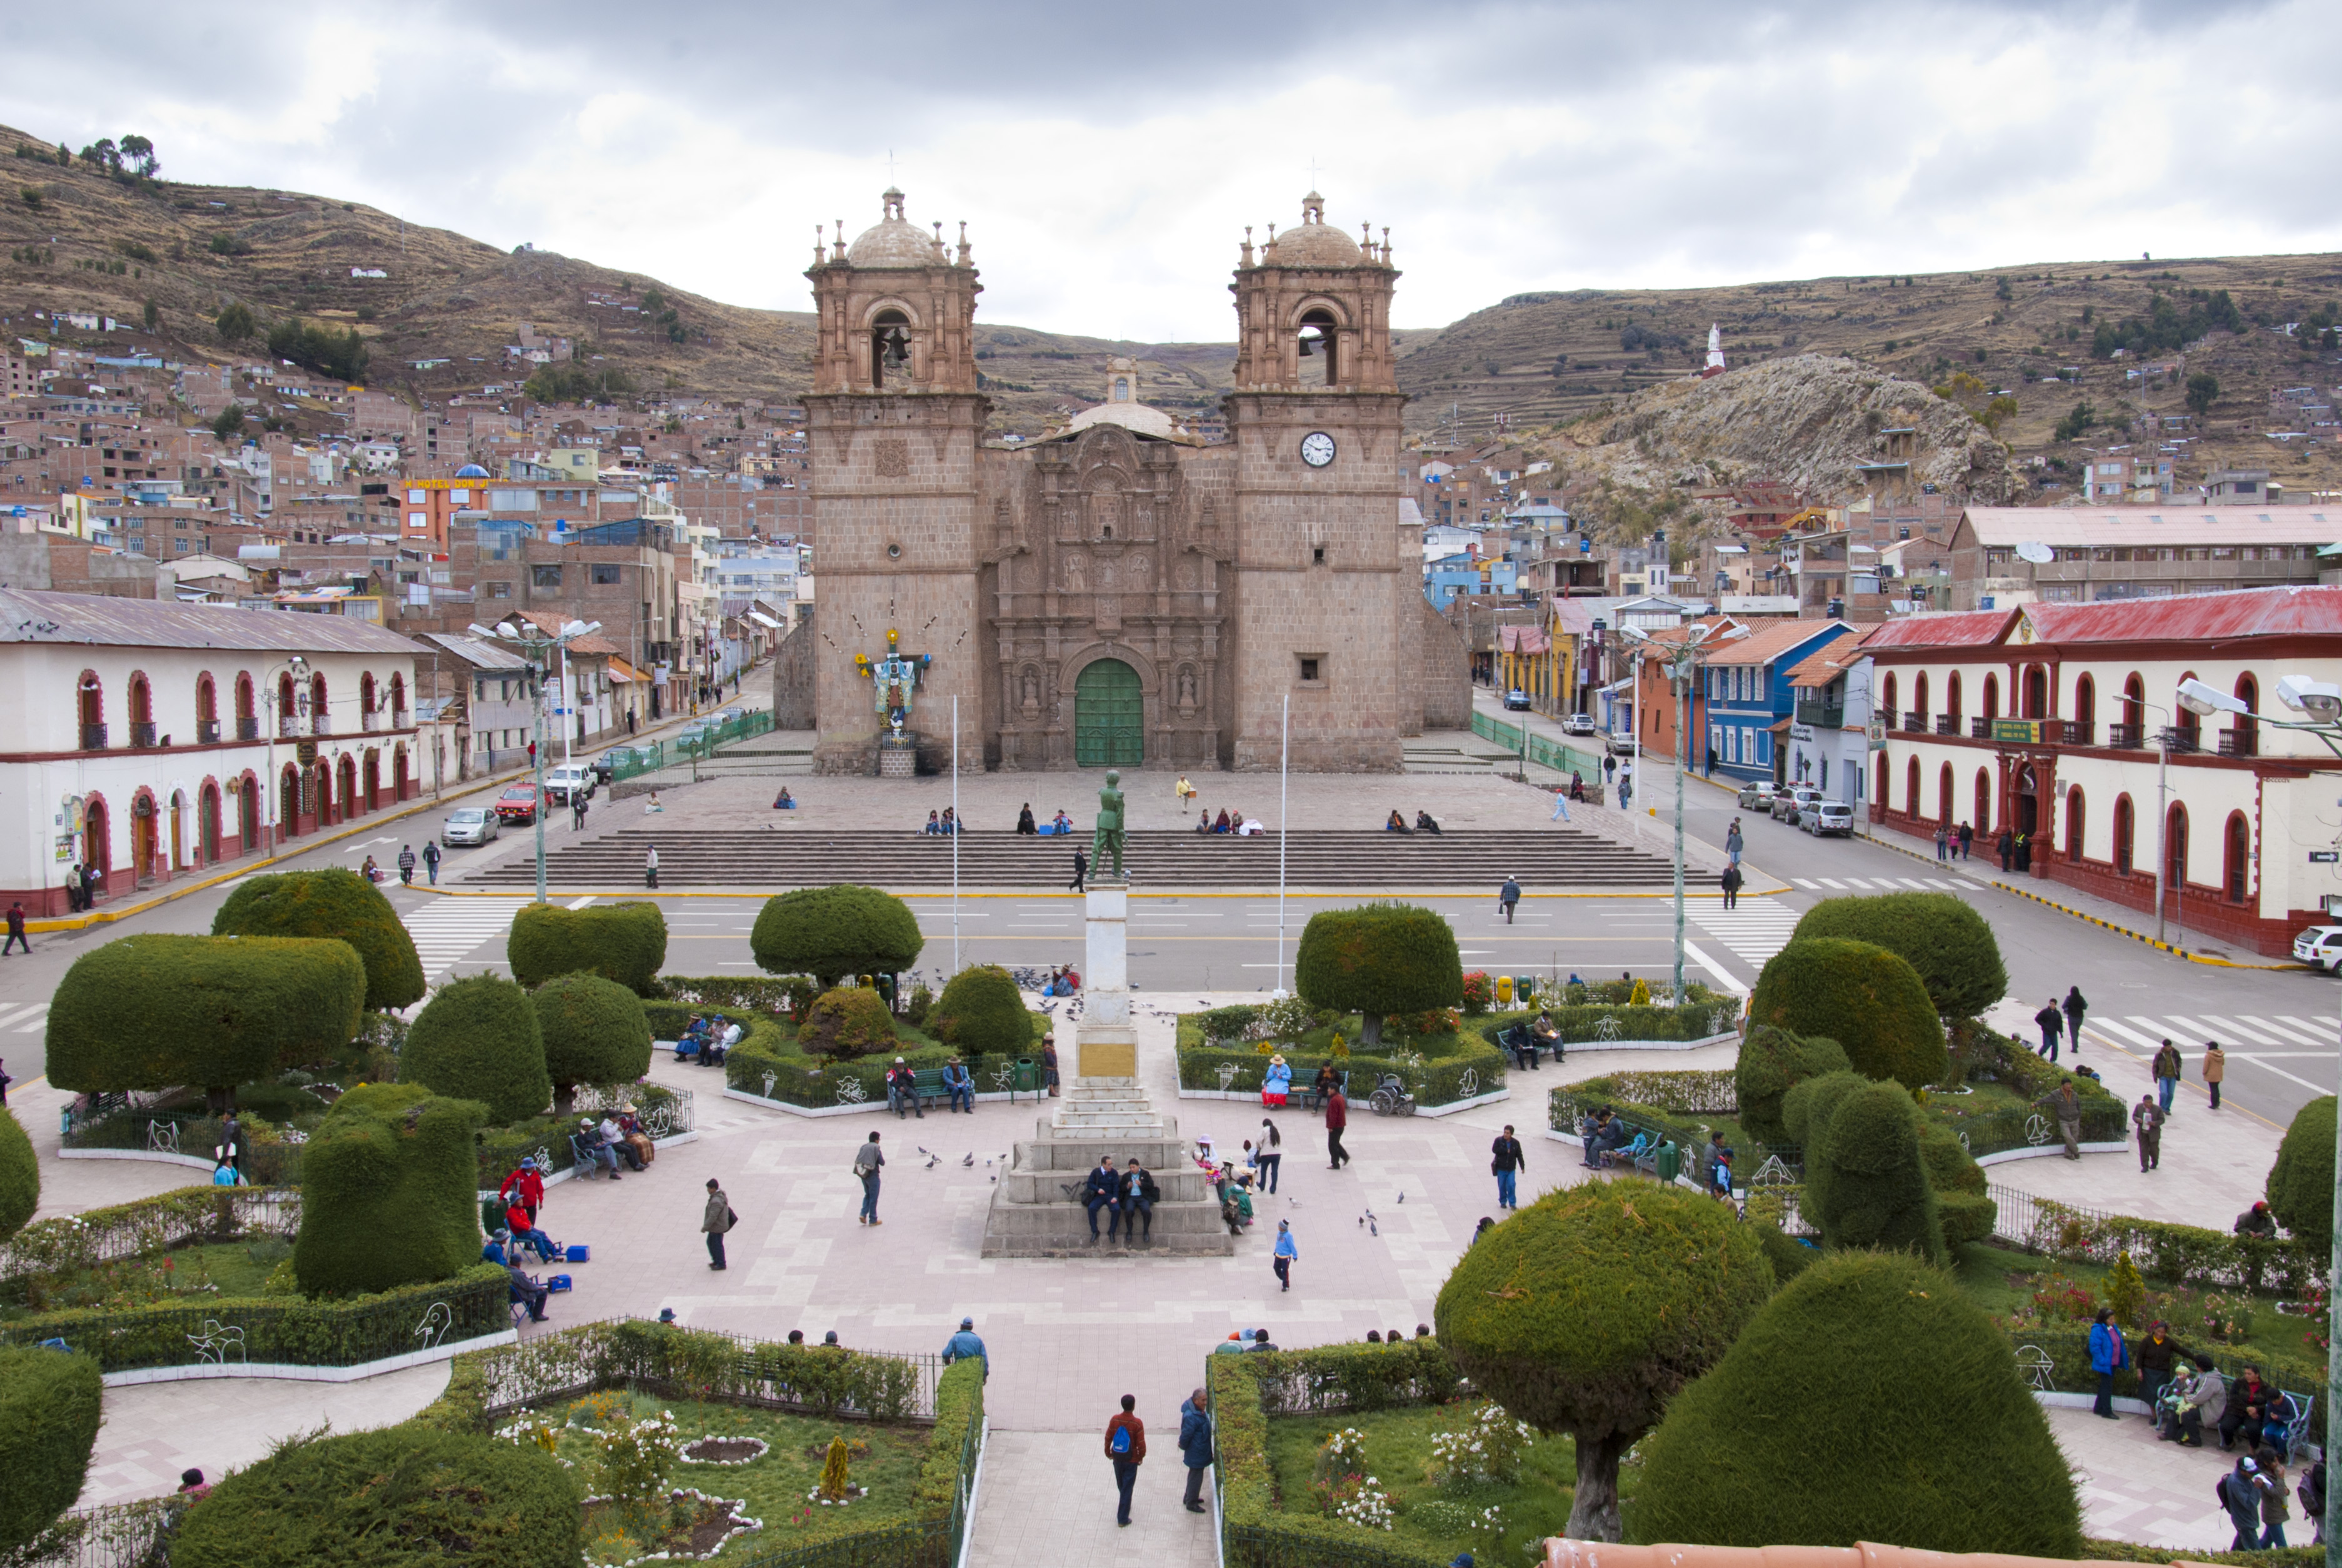 Chile - Bolívia - Peru körutazás: Puno főtér